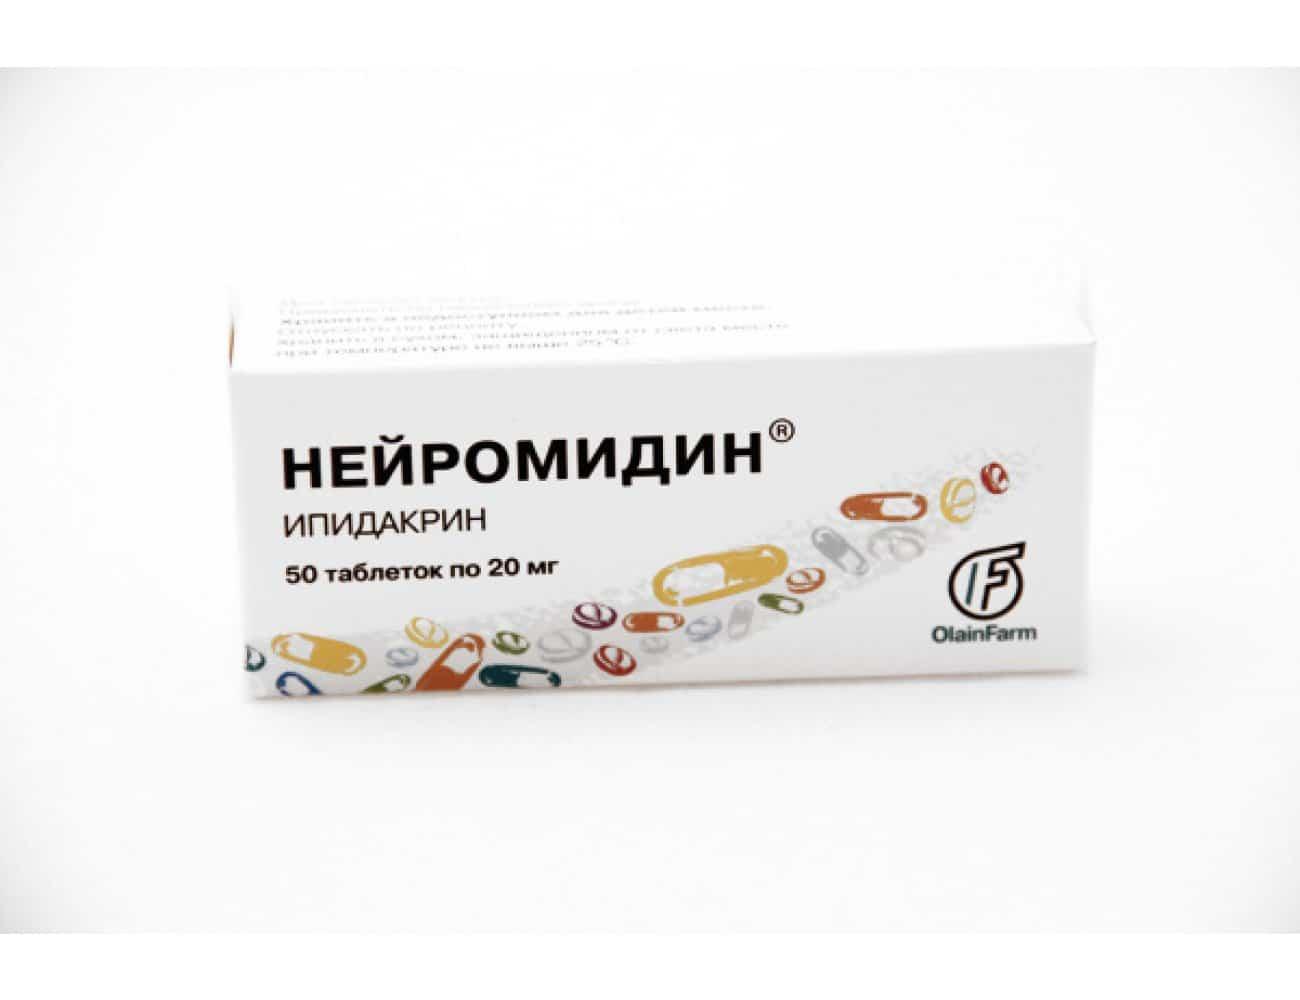 Neuromidin (ipidacrine hydrochloride) tablets 20 mg. №50